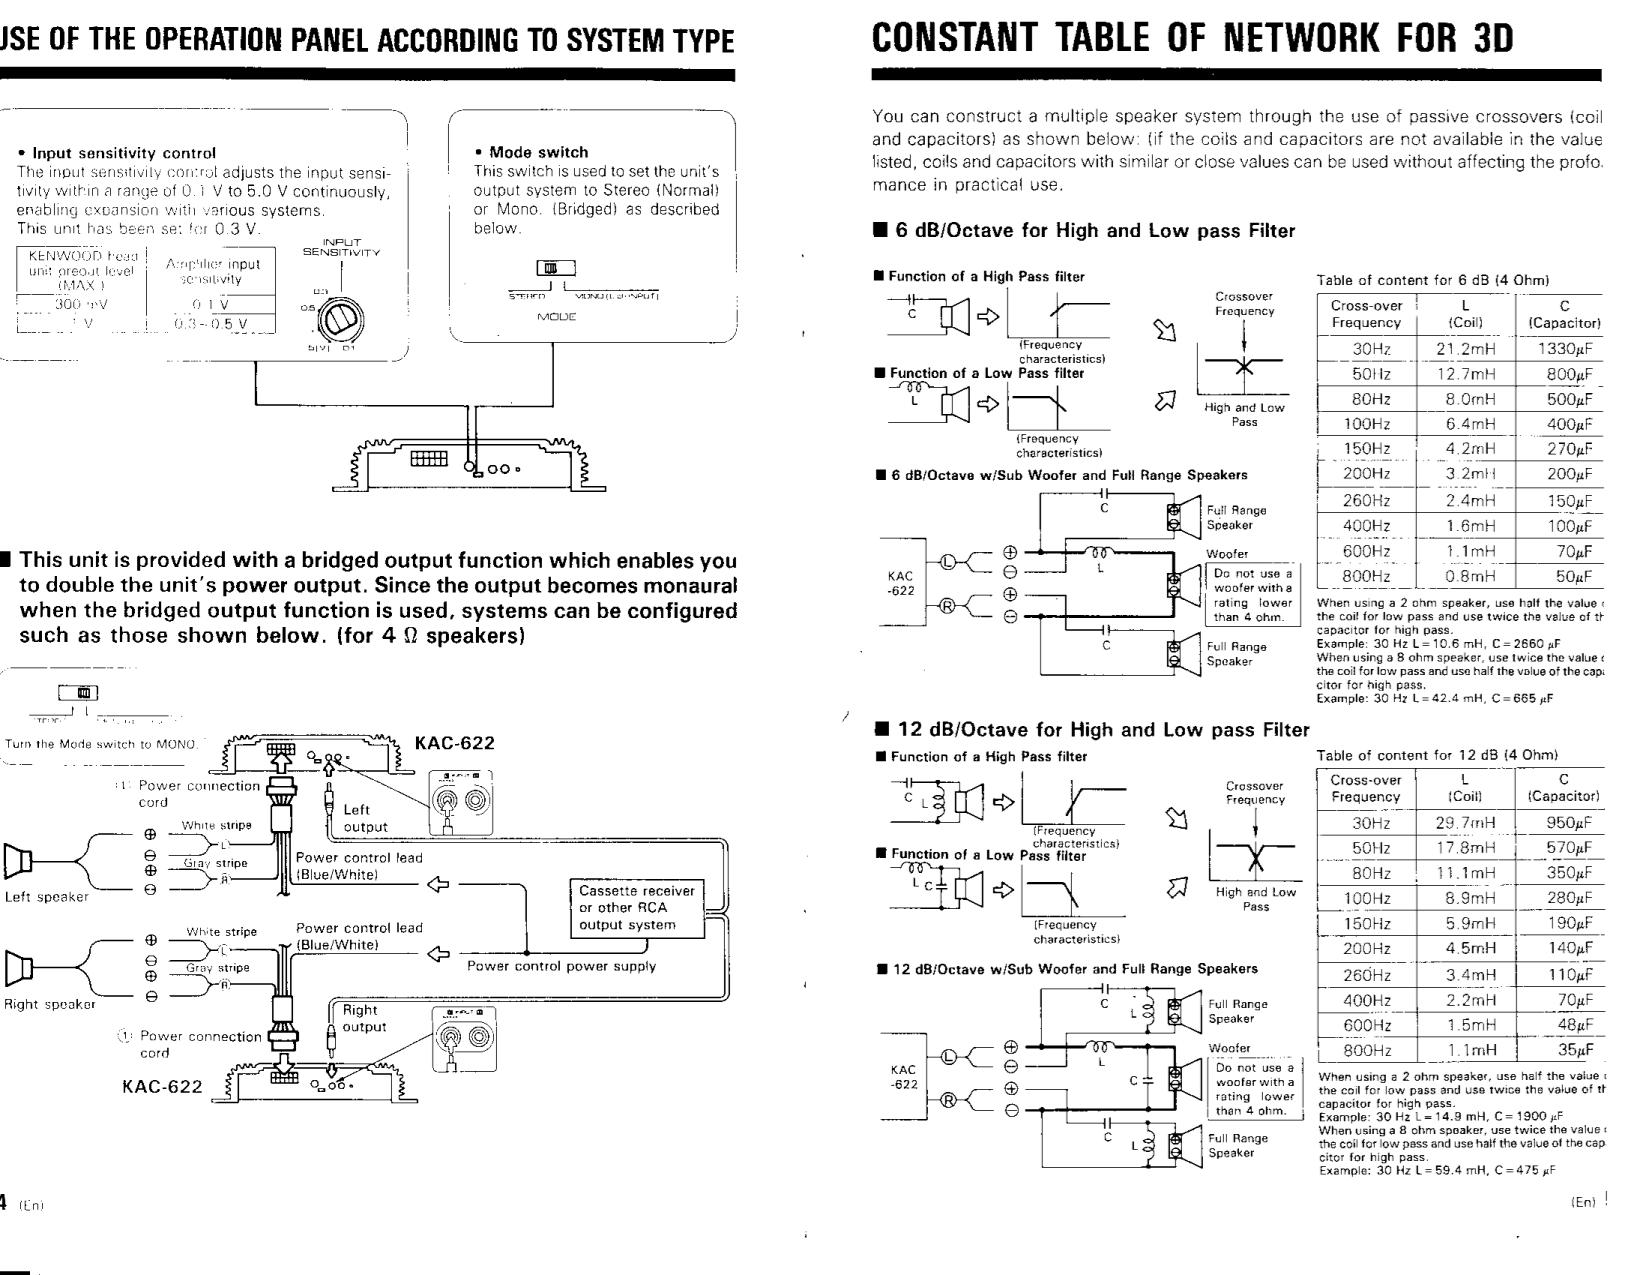 Jd 318 Wiring Diagram Model Moo318x224293. . Wiring Diagram Jd Wiring Diagram Model Moo X on